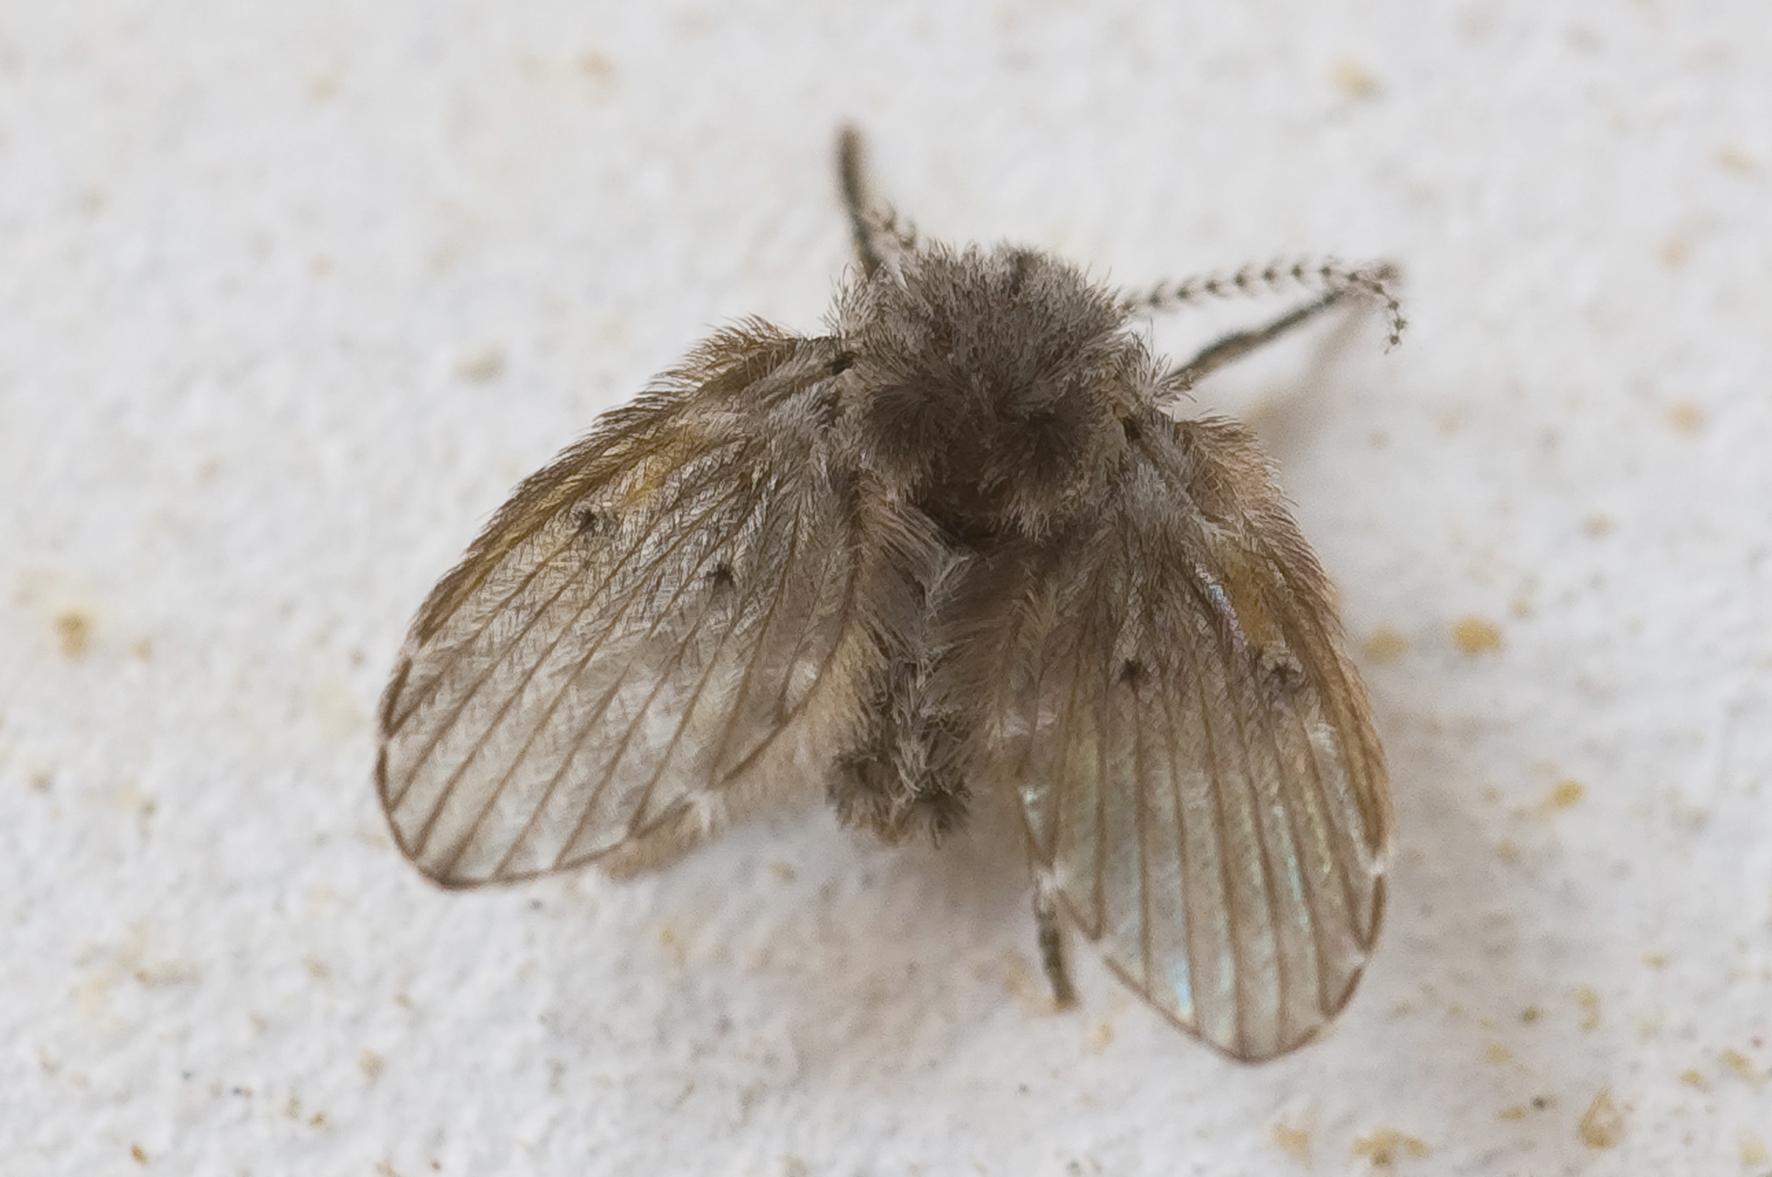 Rioollucht In Keuken : Last van rioolvliegjes? of rioolvliegen en rioolstank in de